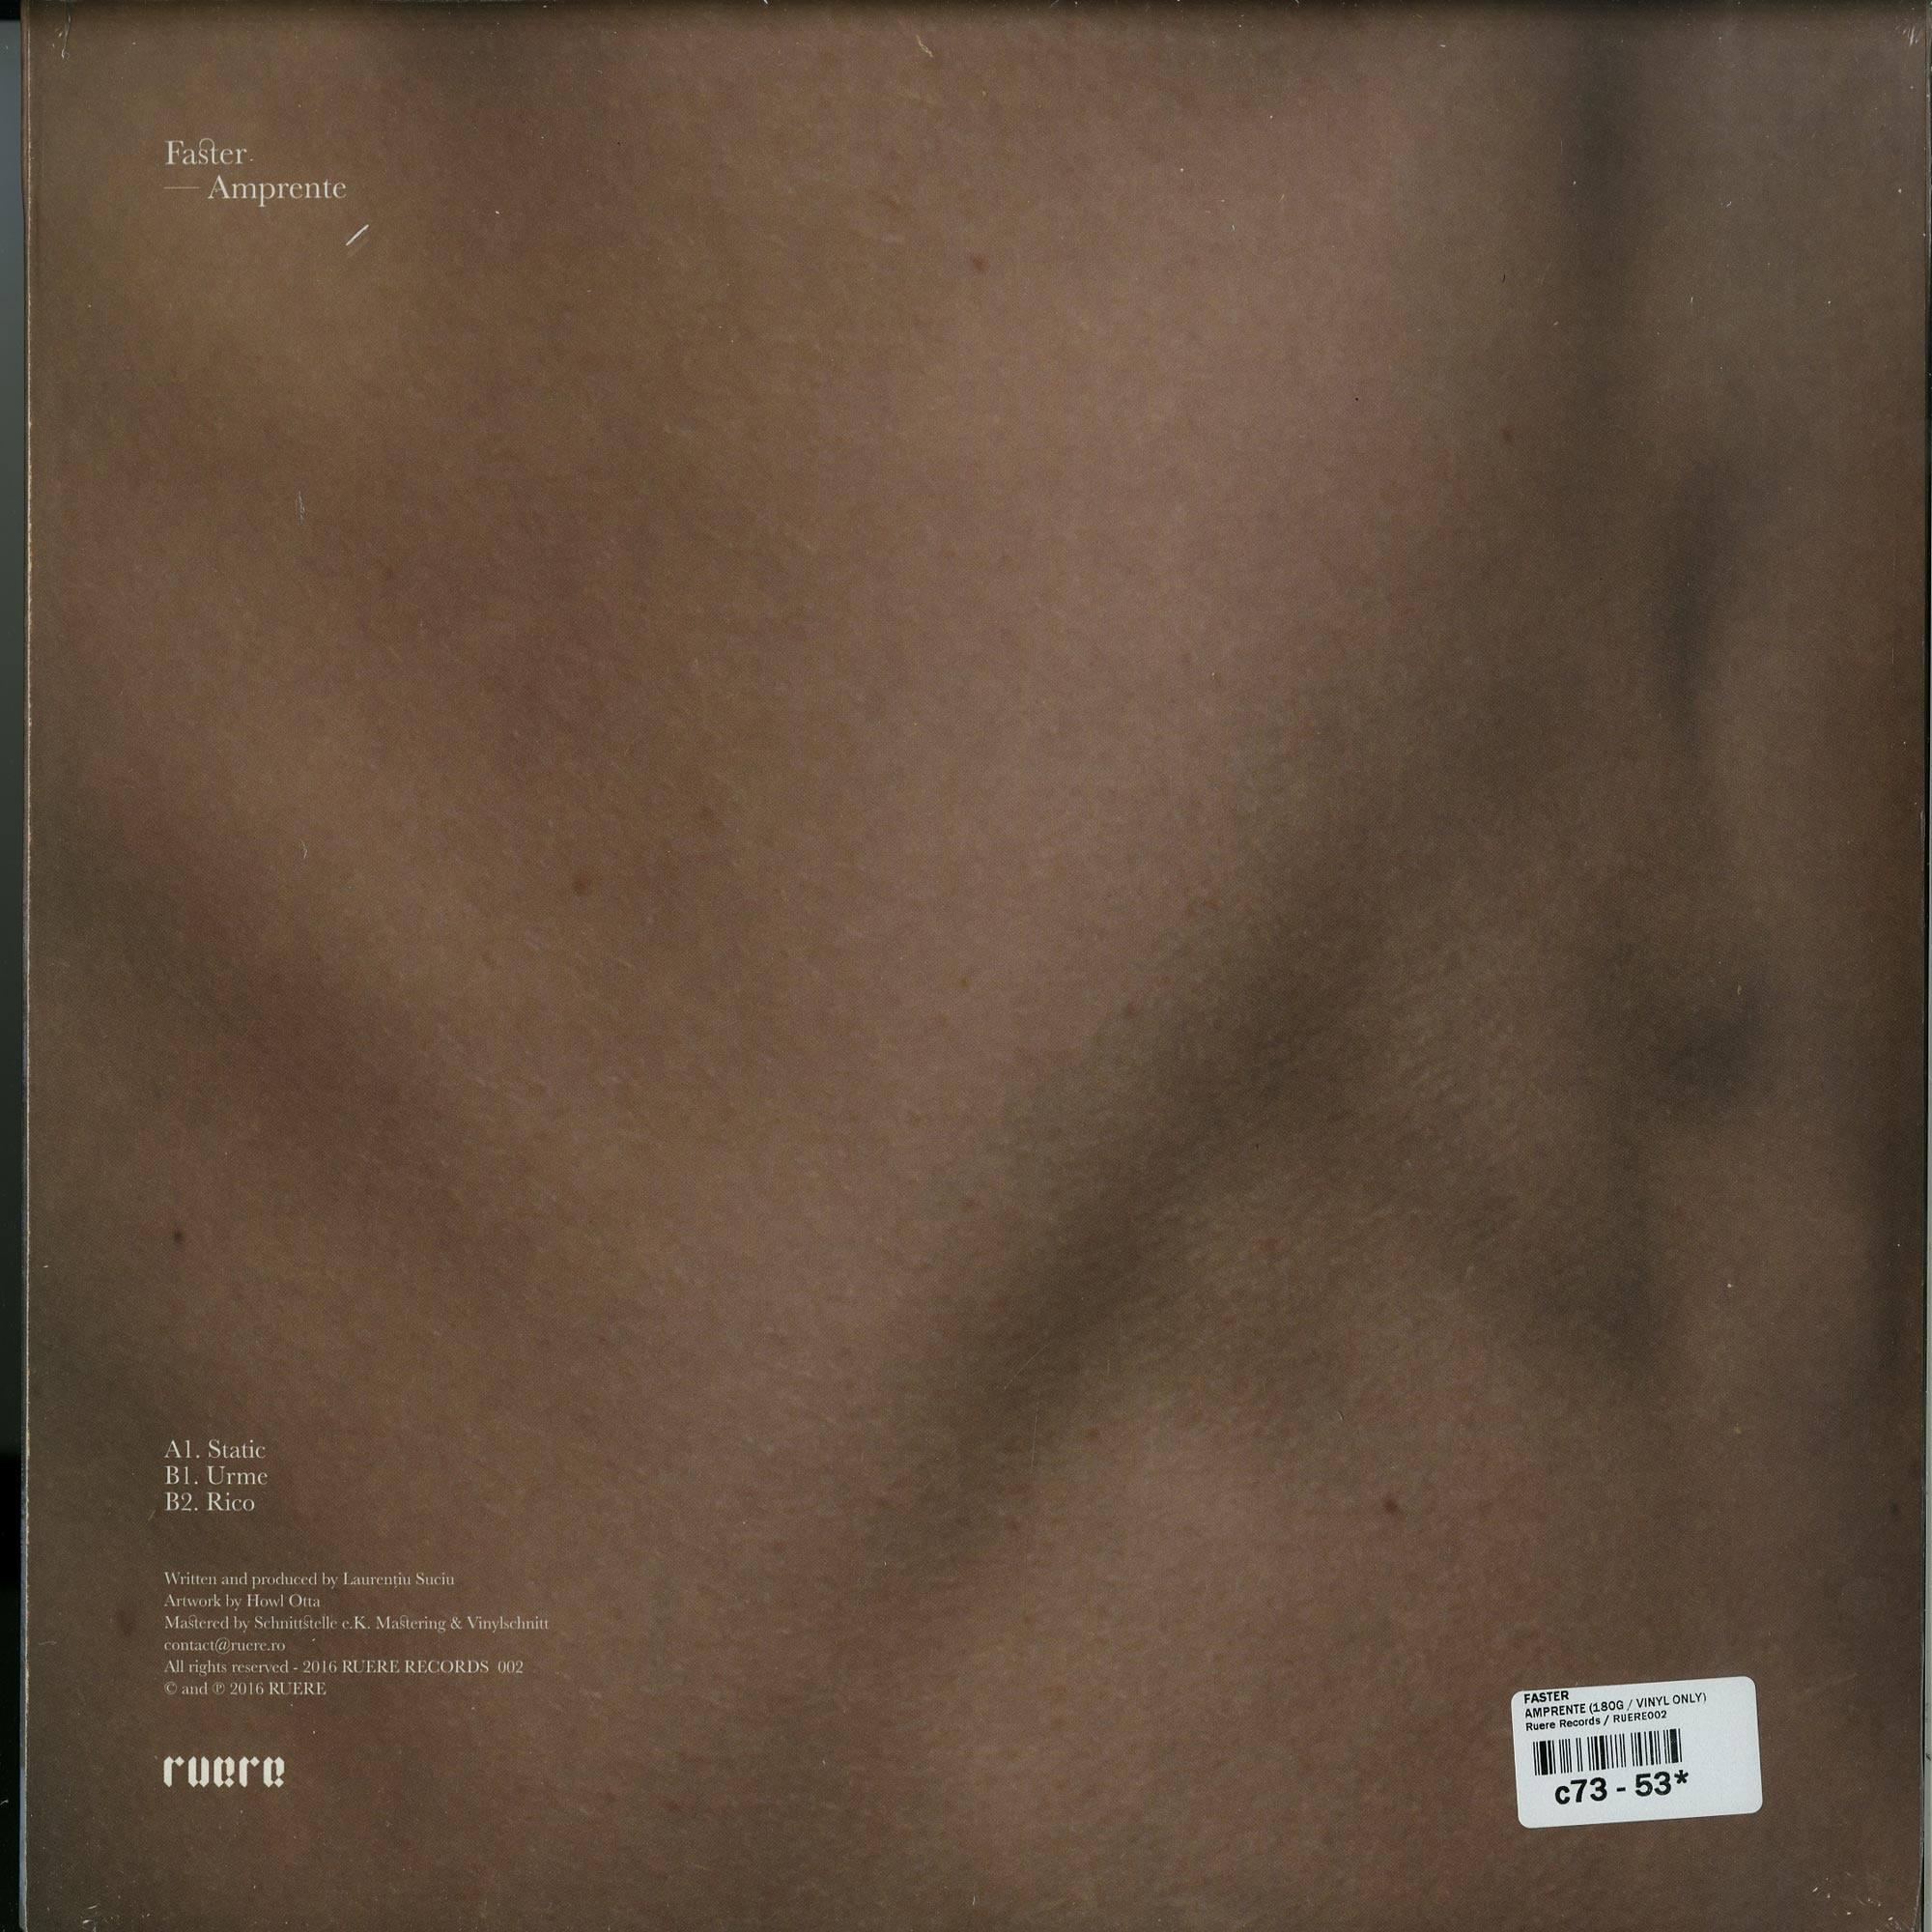 Faster - Amprente EP